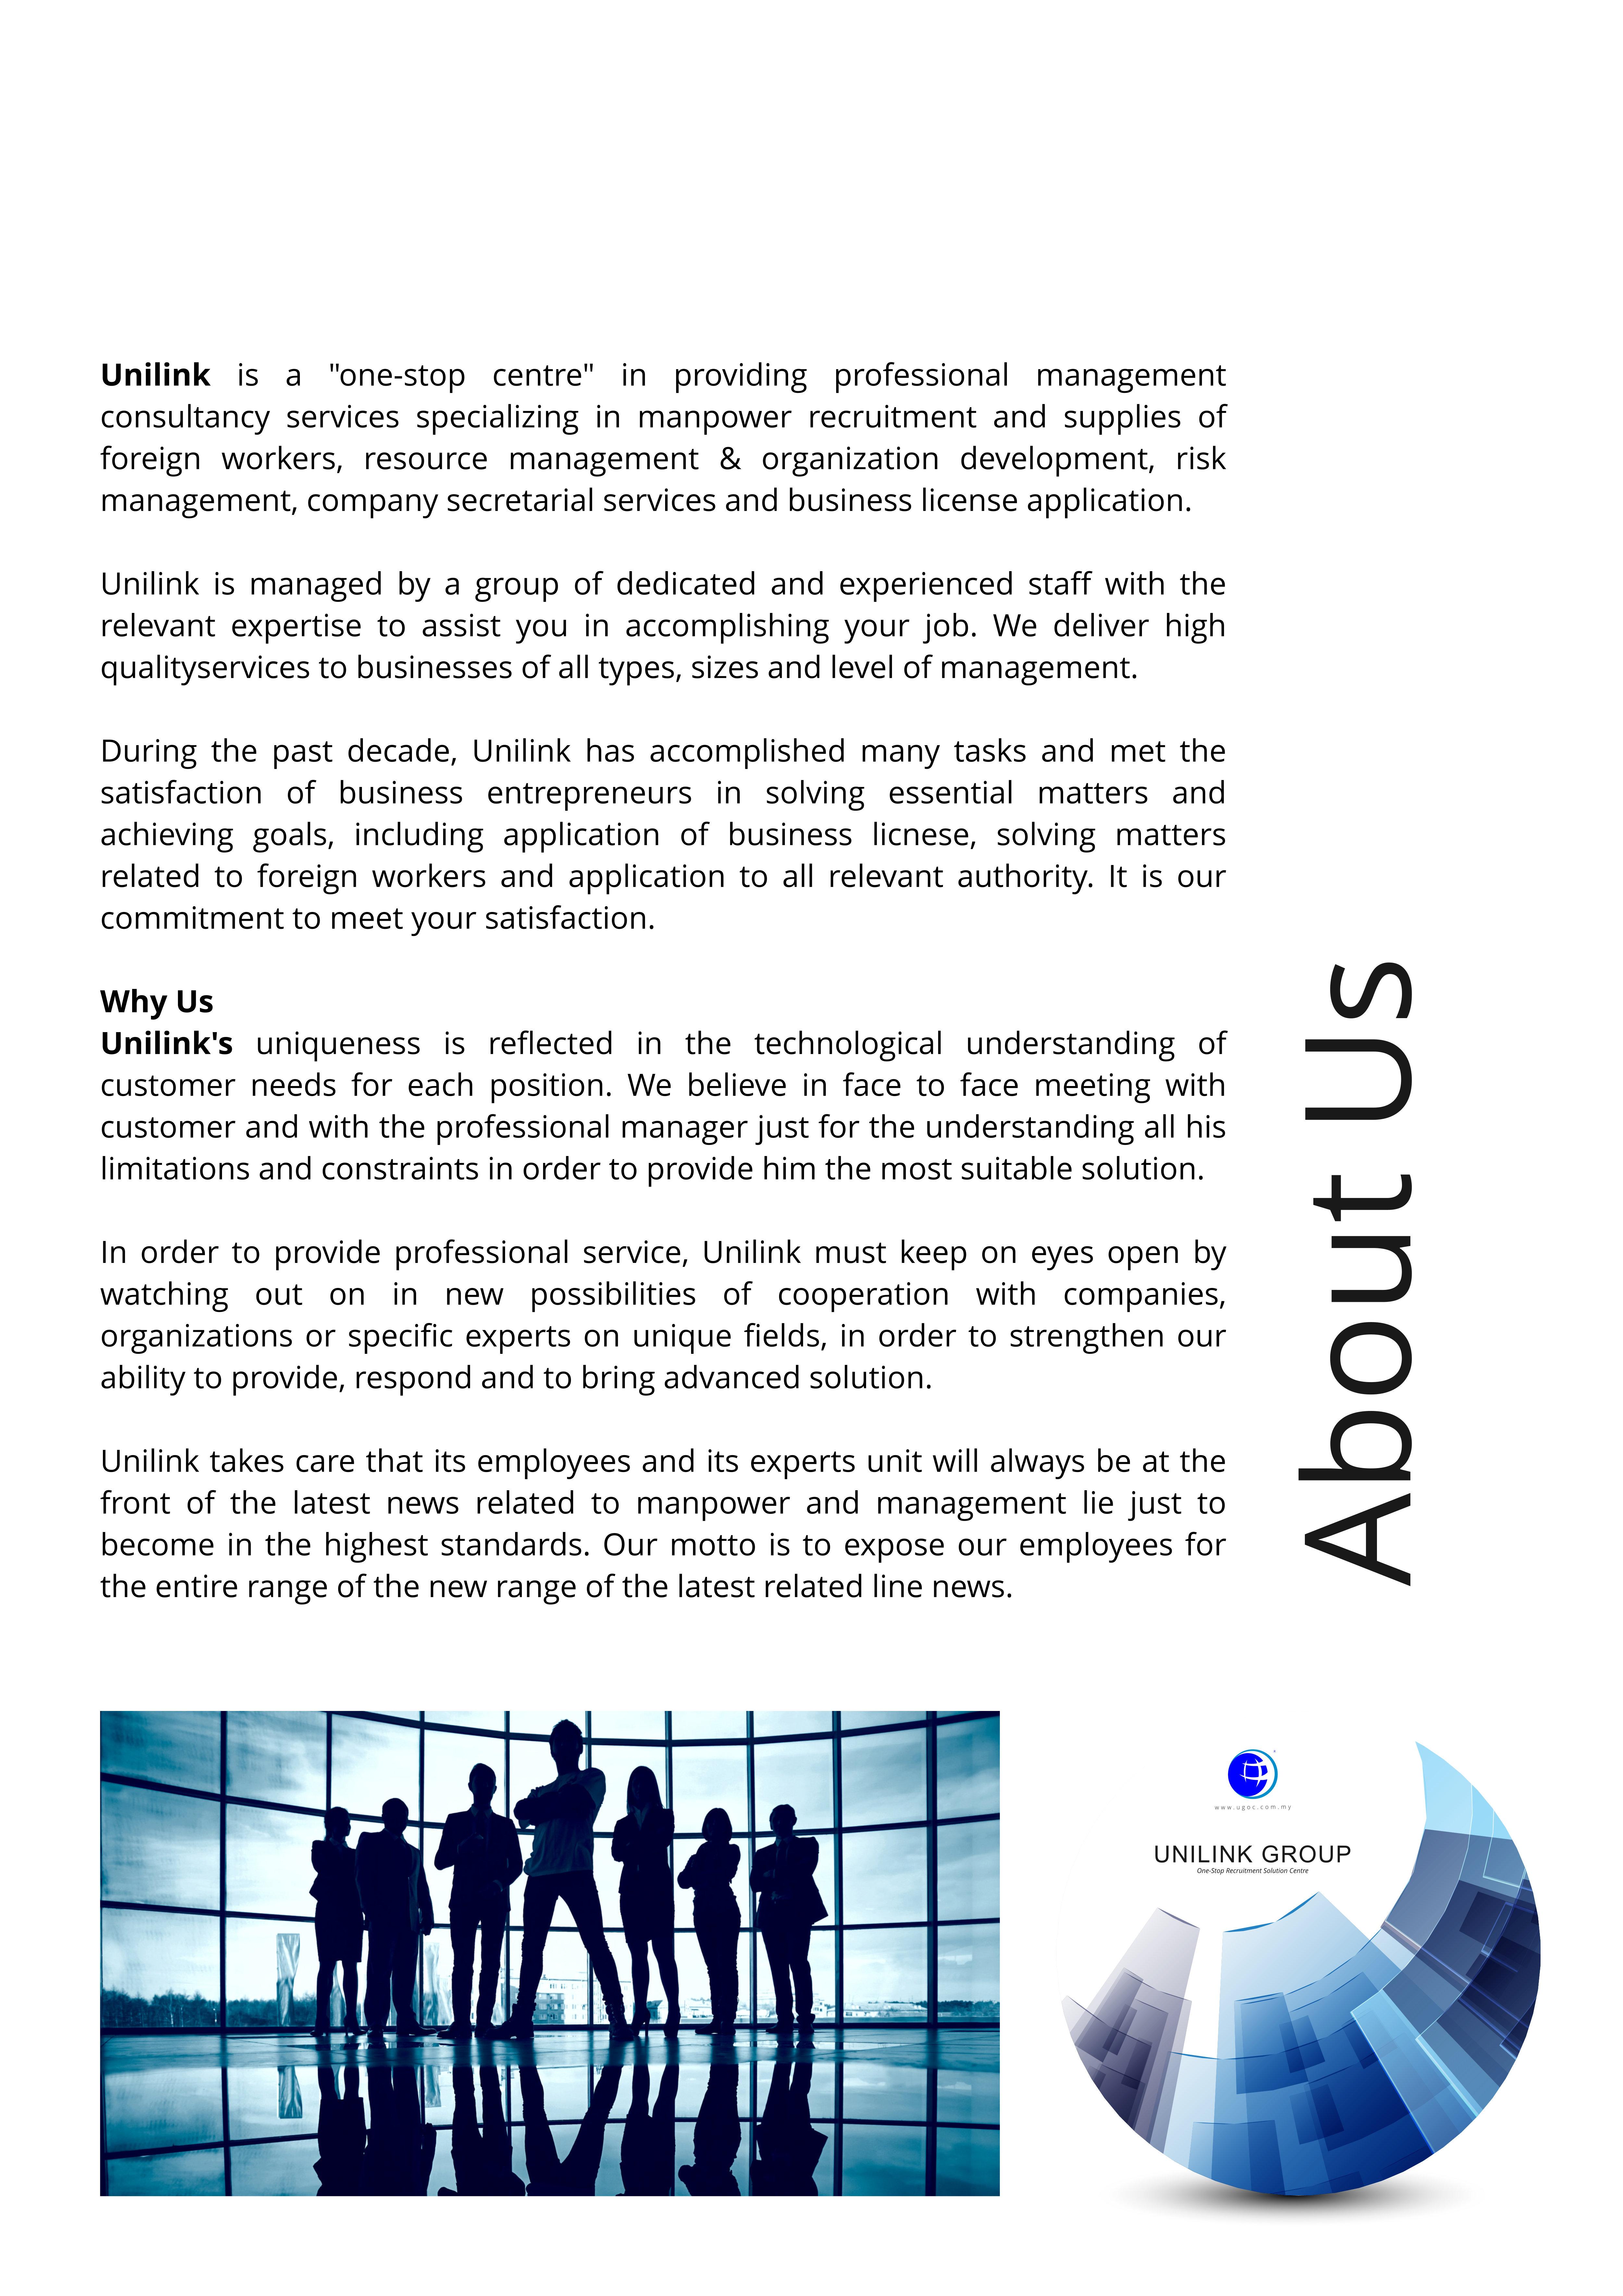 Company Profile of Agensi Pekerjaan Unilink Prospects Sdn Bhd